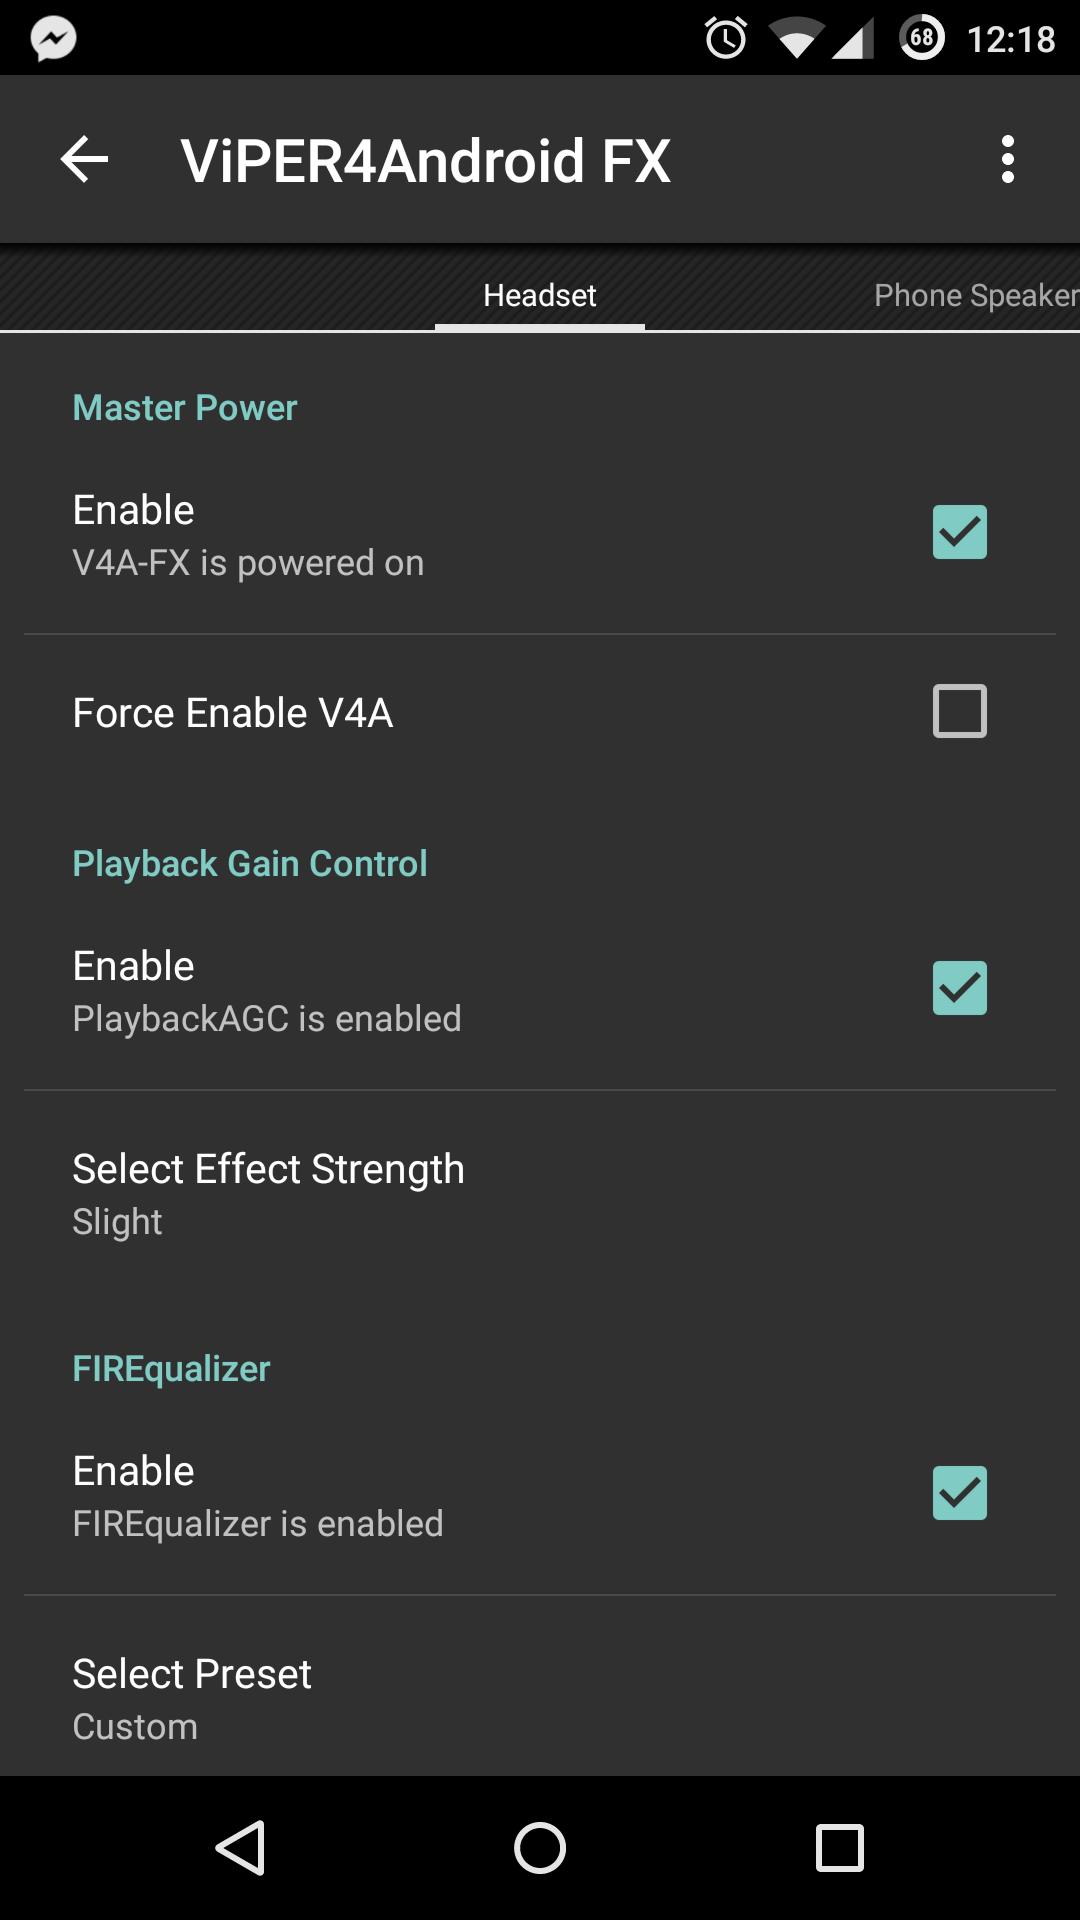 [APPLICATION ANDROID - VIPER4ANDROID] Améliorer et booster le son sur Android [Gratuit/Payant][20.02.2017] Attachment